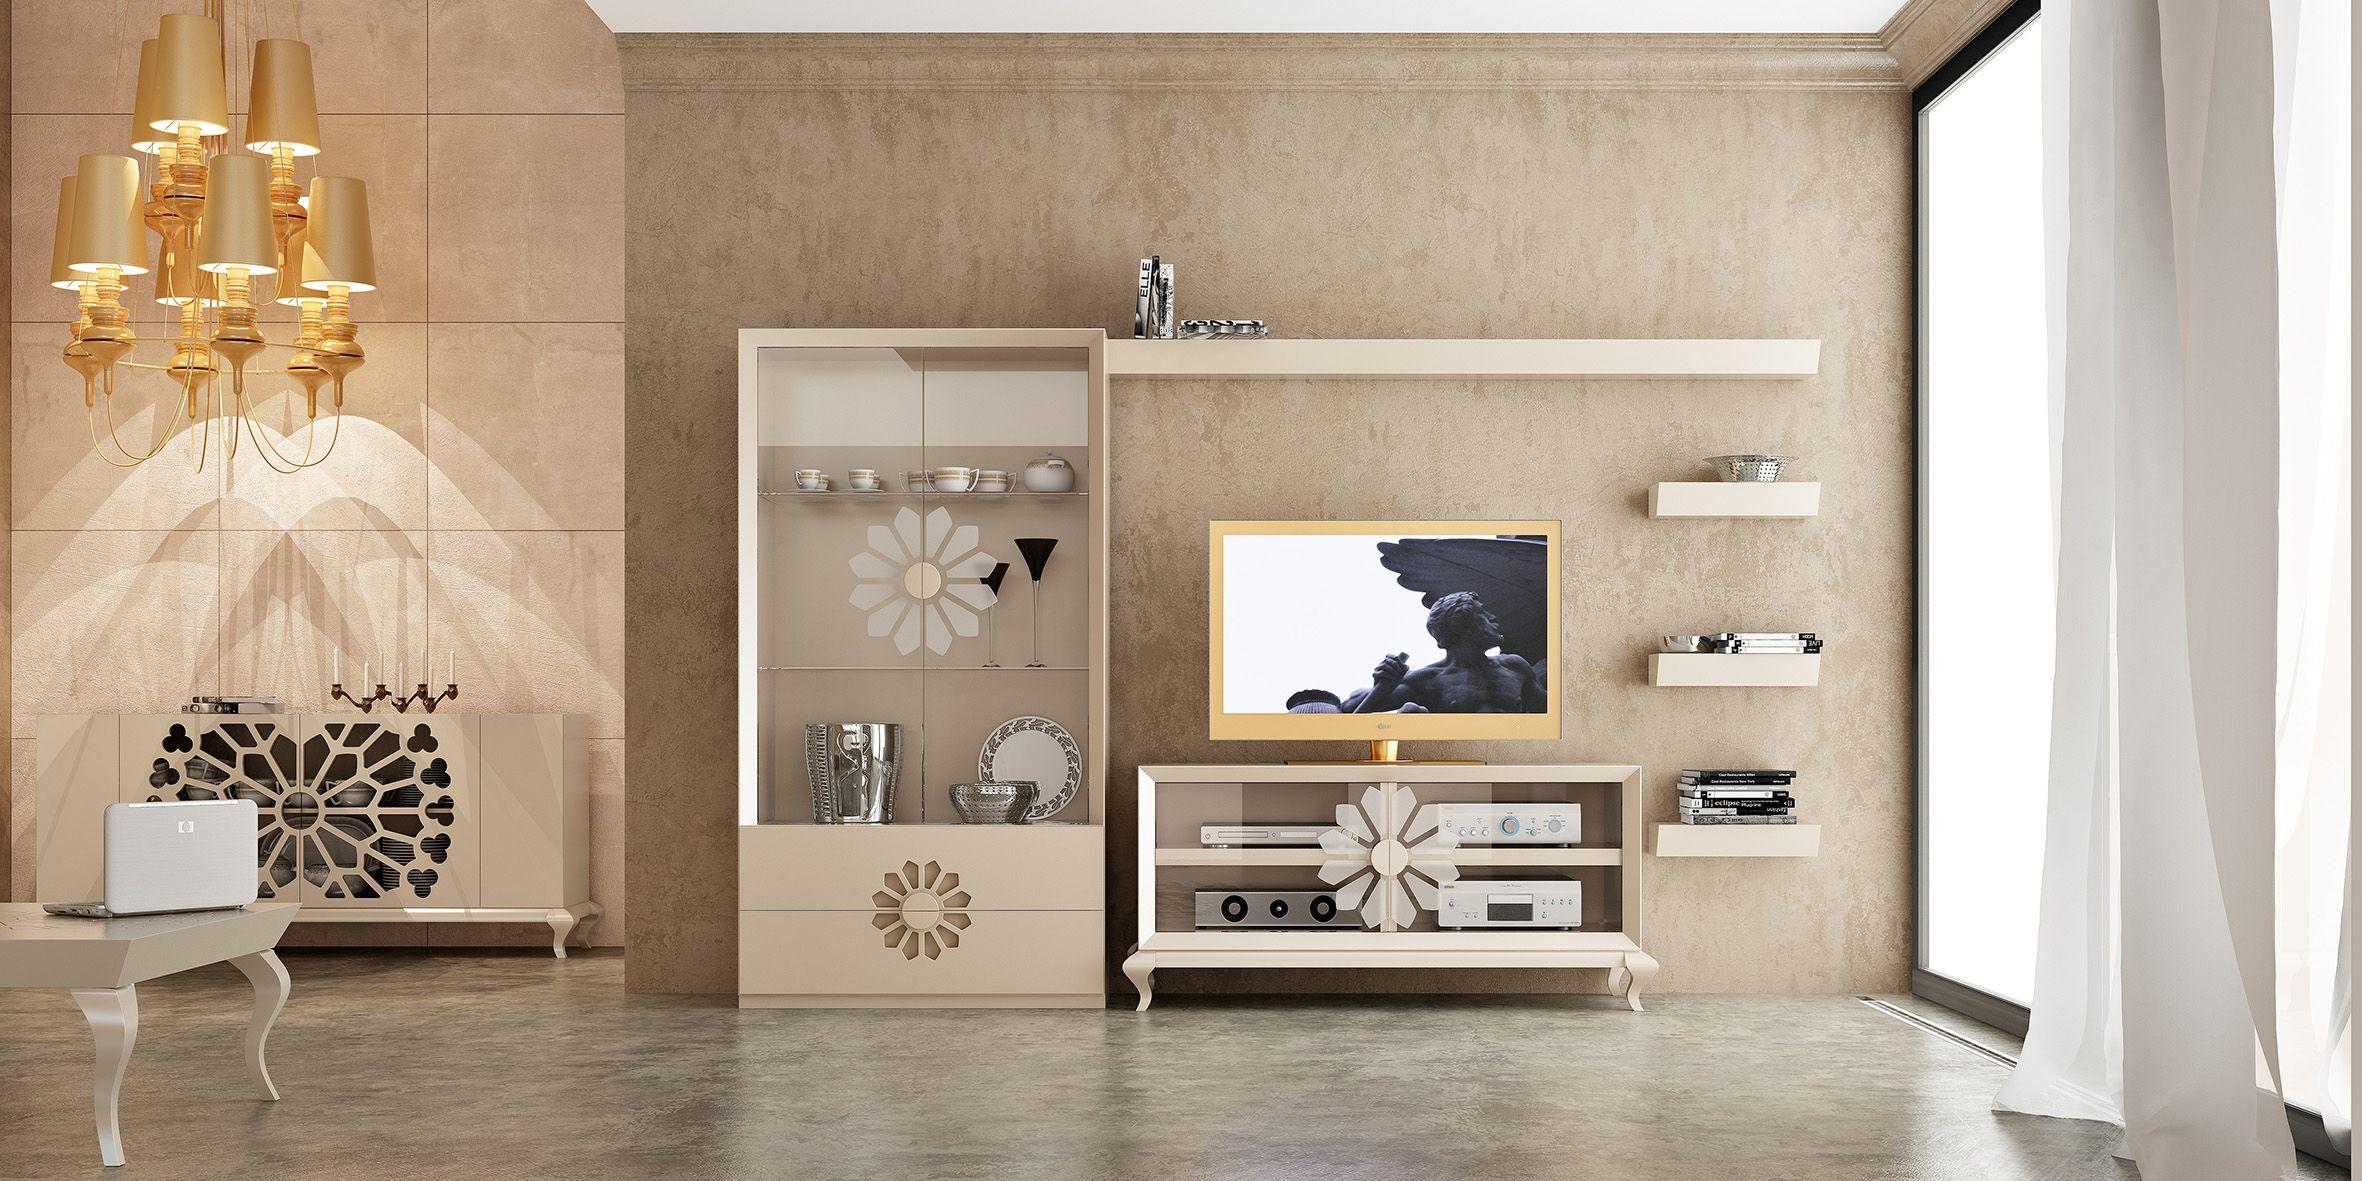 Mueble Tv Klassic Tv Mueble Wallunittv Salones Mueblesdesalon  # Muebles Franco E Hijos